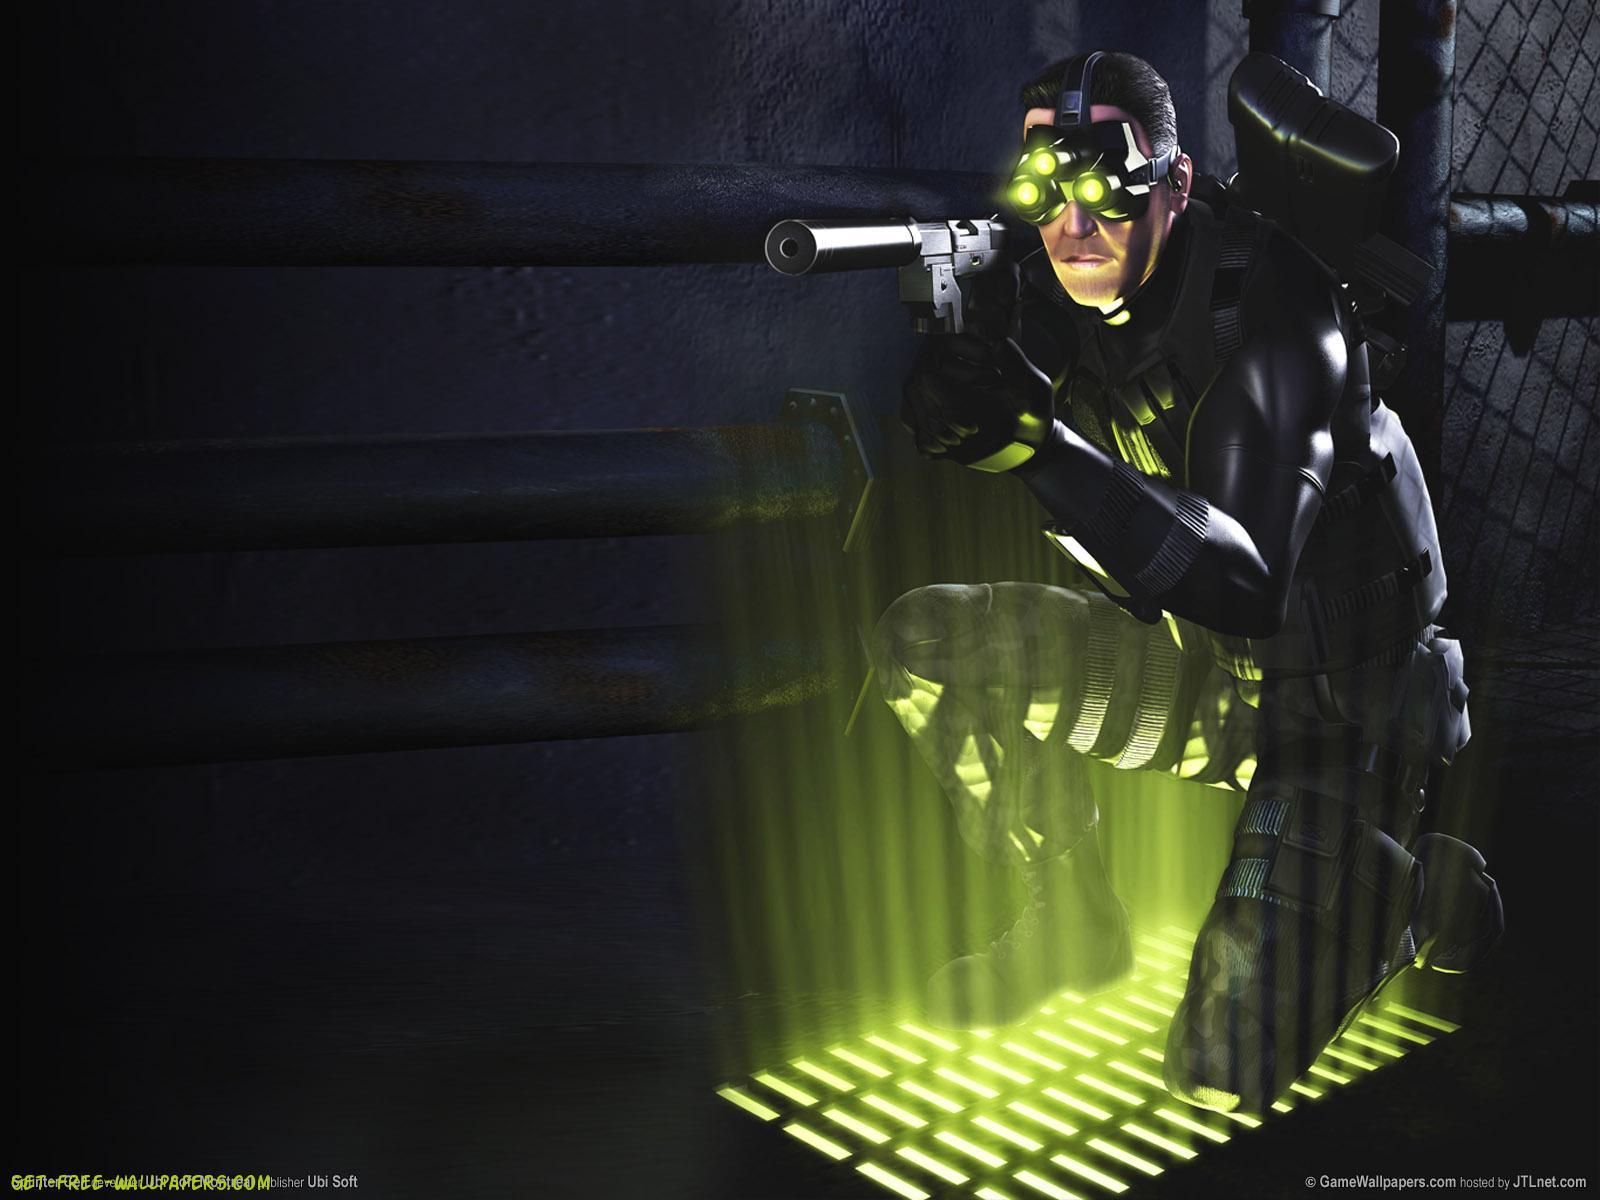 Download Splinter Cell Wallpaper 1600x1200